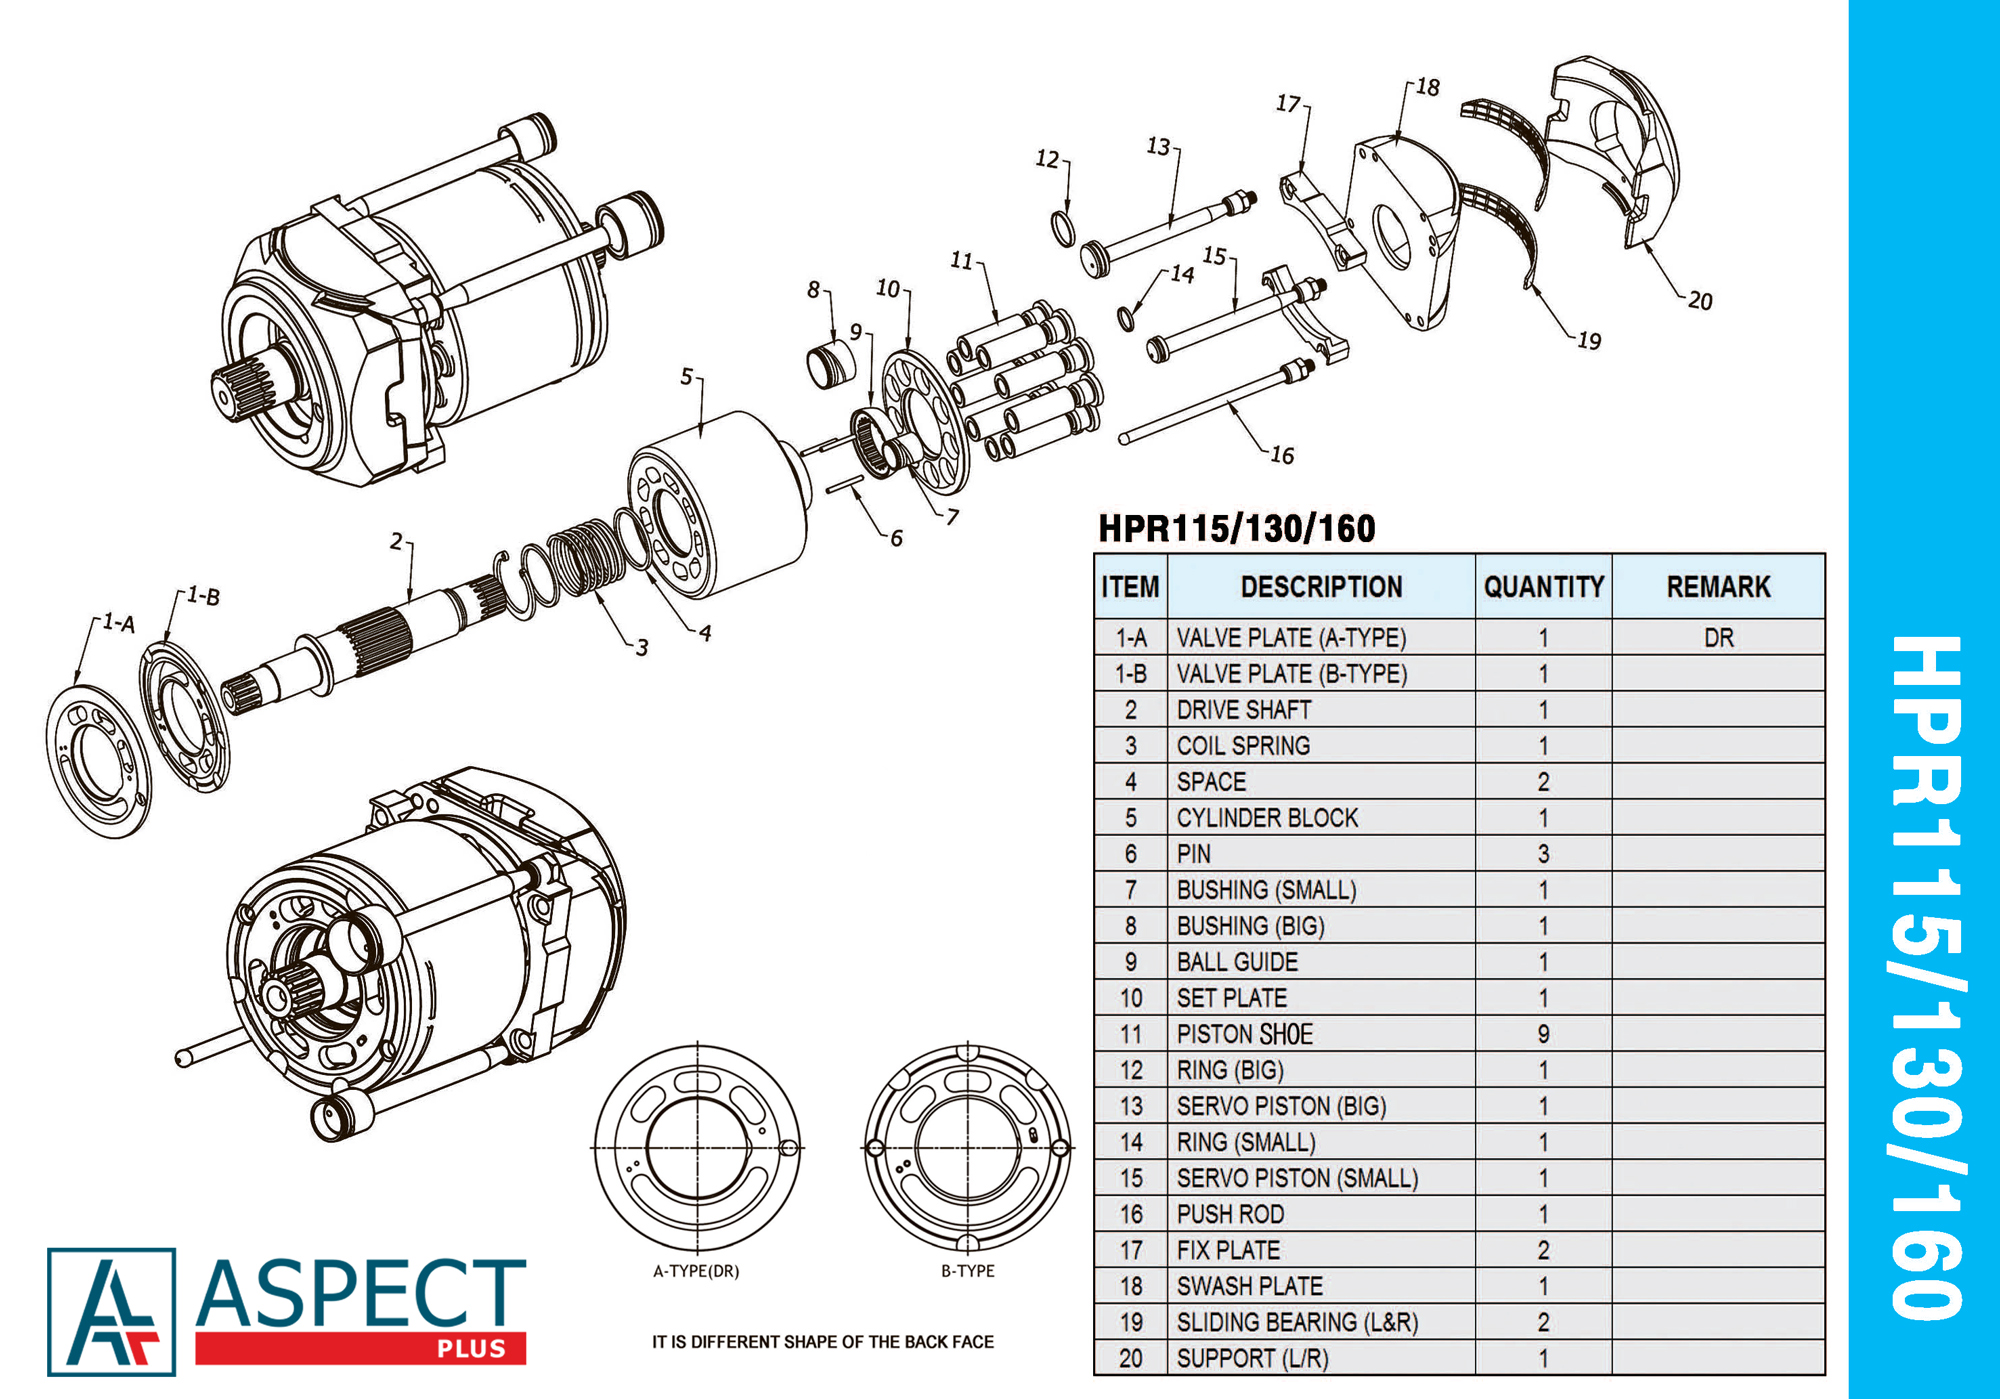 LINDE HPR115 HPR130 HPR160 схема сборки